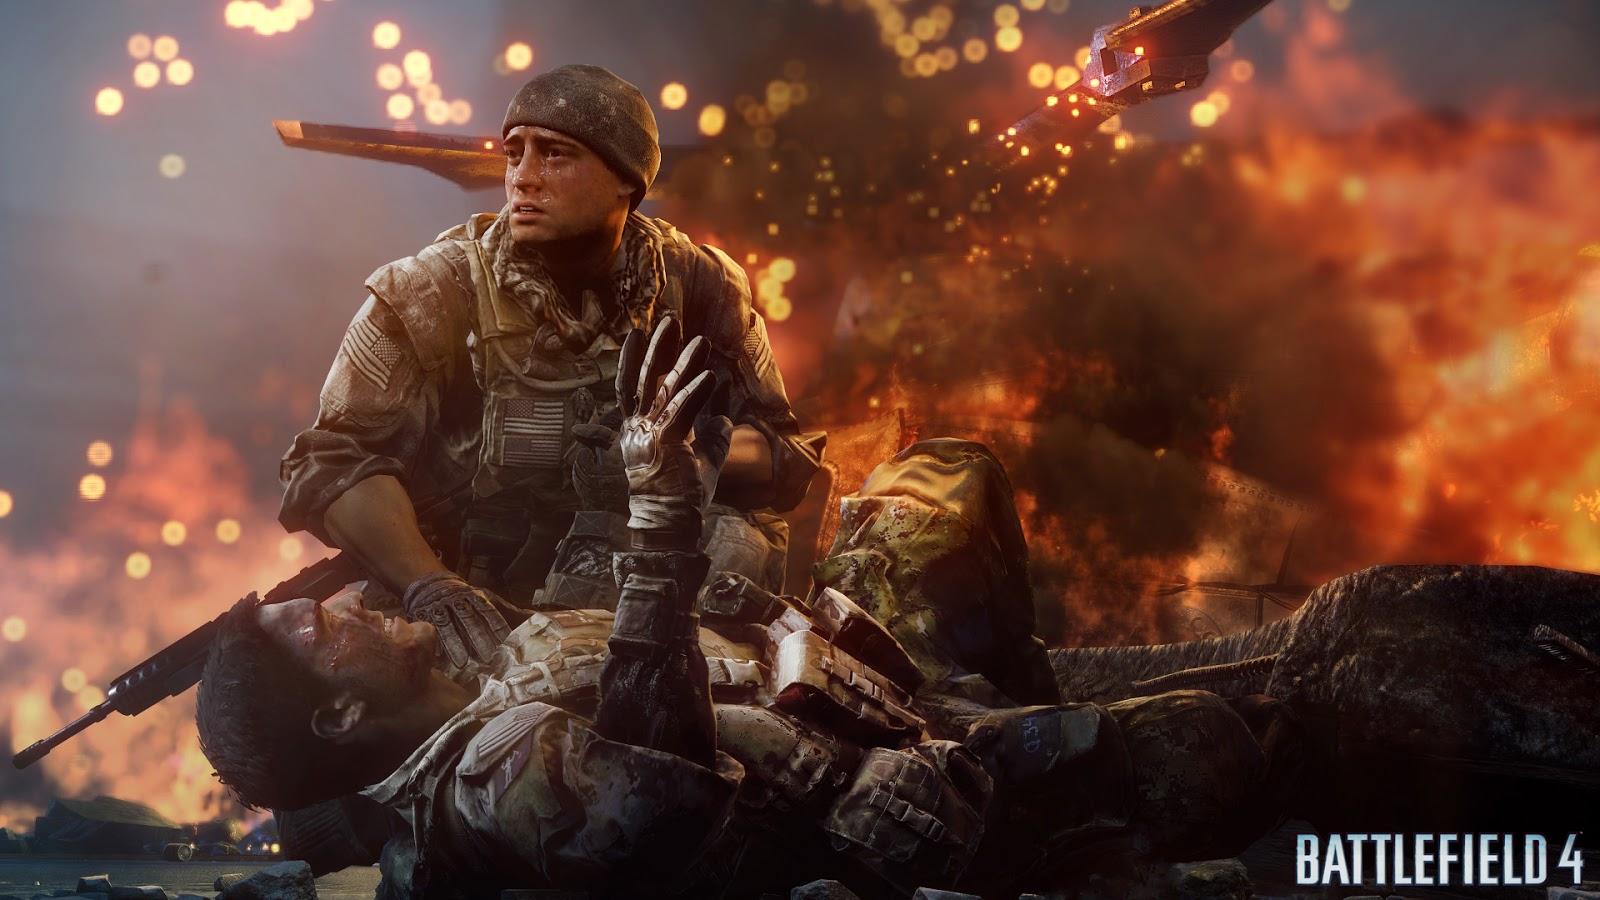 Download Grátis Papel de Parede do Battlefield 4